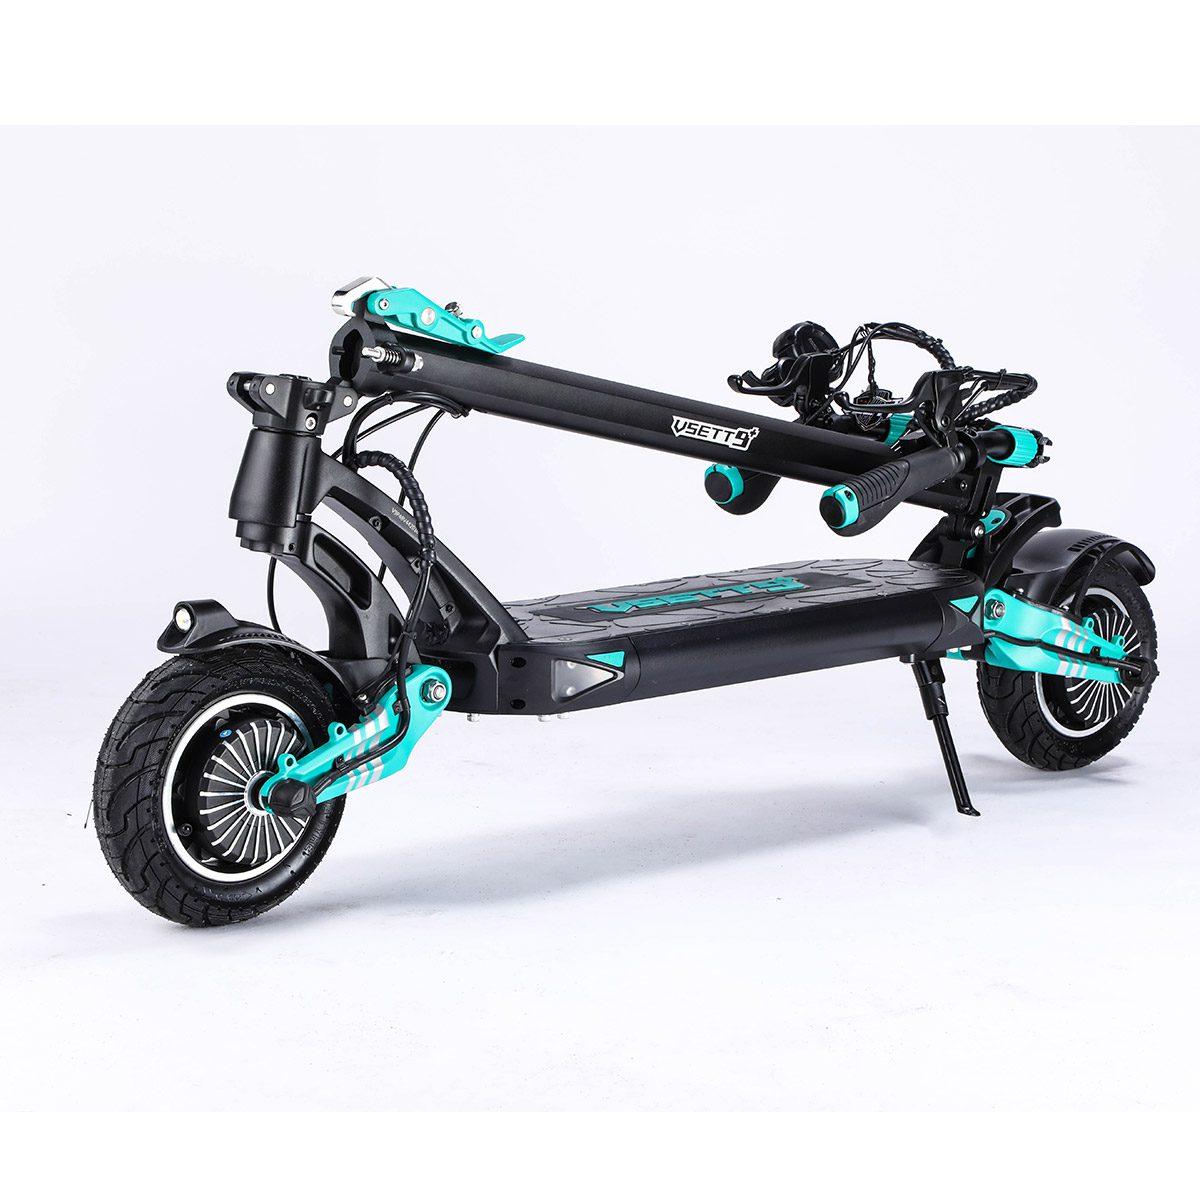 https://personalelectrictransport.co.uk/wp-content/uploads/2020/09/VSETT-9-Electric-Scooter-London-2020-fold.jpg